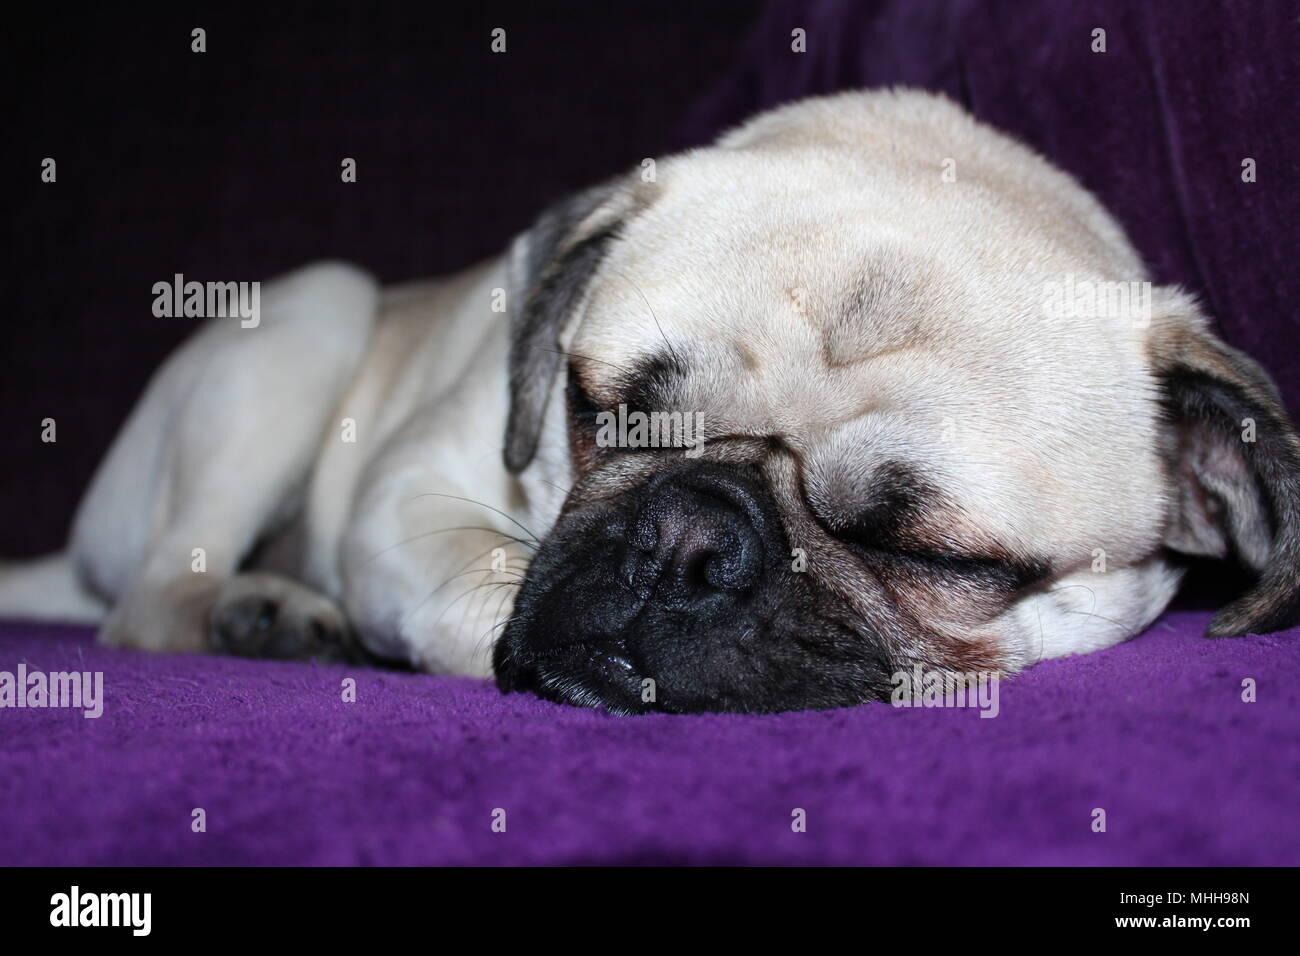 A one year old male Pug dog asleep Stock Photo